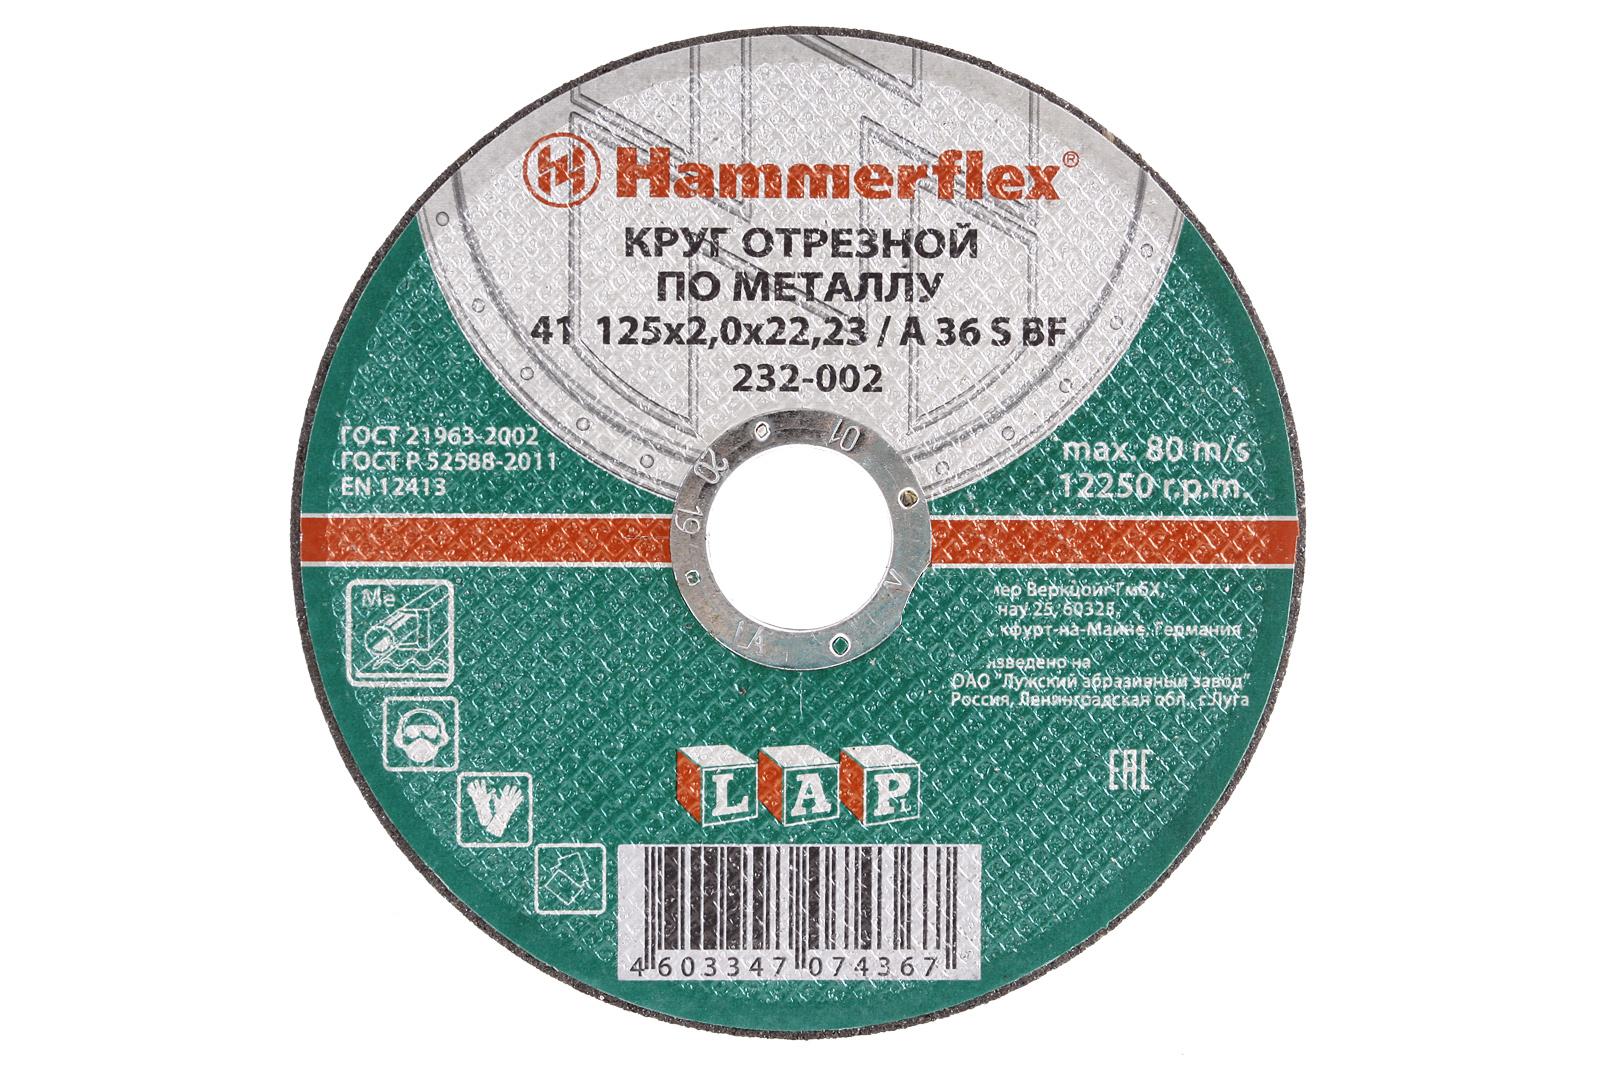 Круг отрезной Hammer 125 x 2.0 x 22 по металлу Коробка (200шт.) круг отрезной hammer 150 x 2 0 x 22 по металлу коробка 200шт